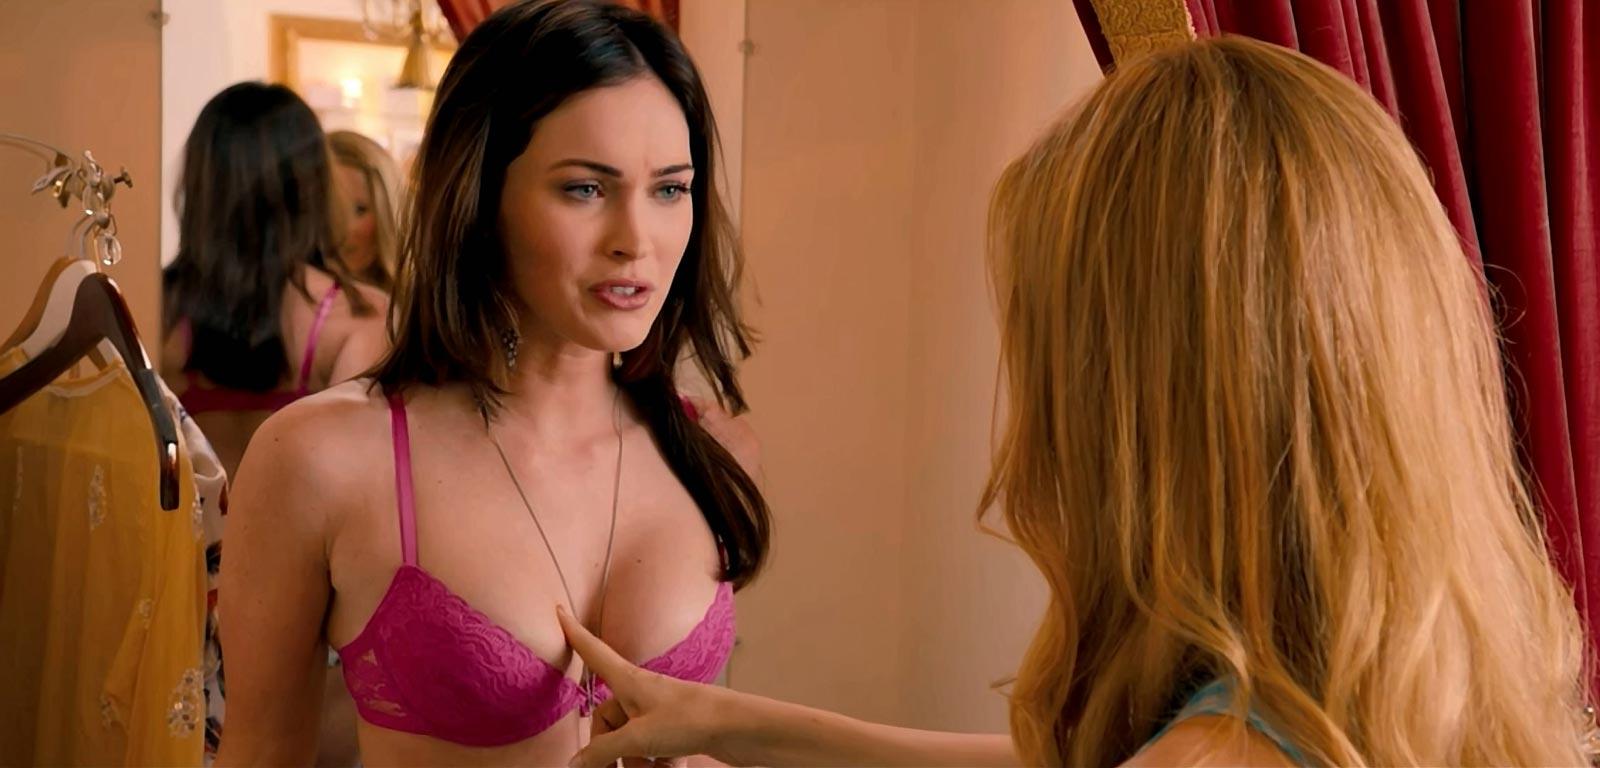 lesbian-slut-movie-thumbs-girls-pussy